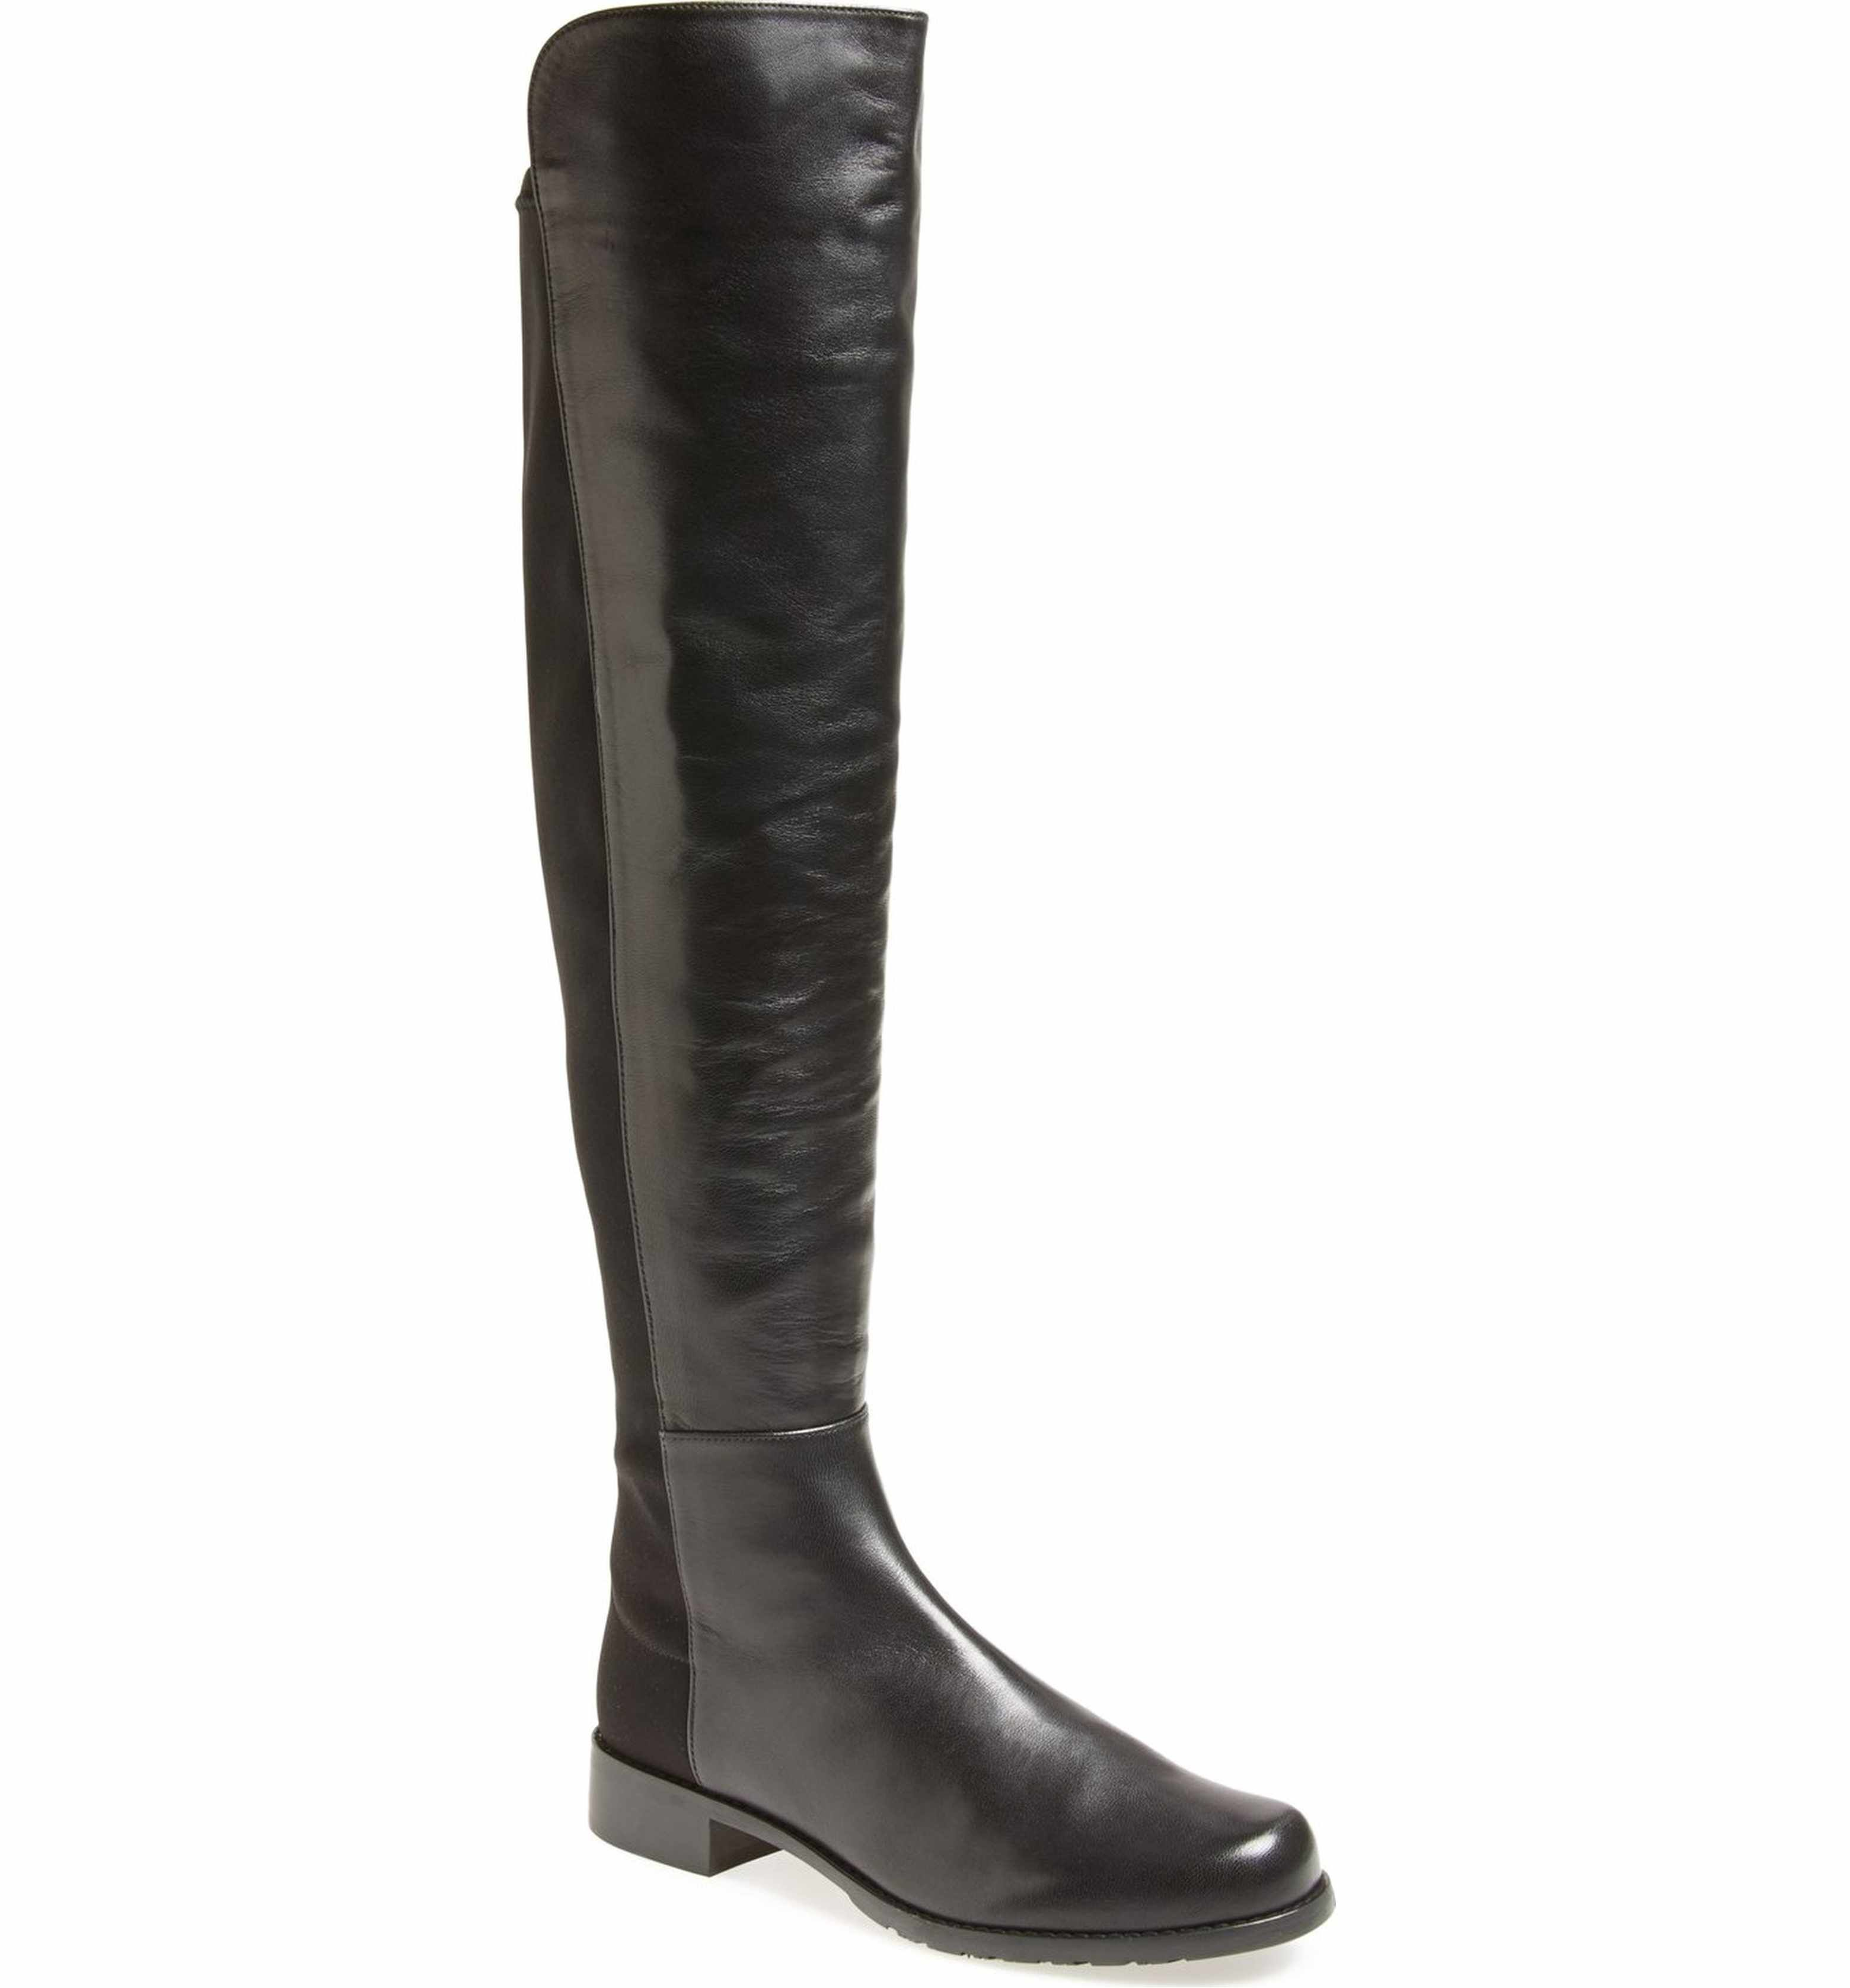 Stuart Weitzman 5050 Over The Knee Leather Boot (Women